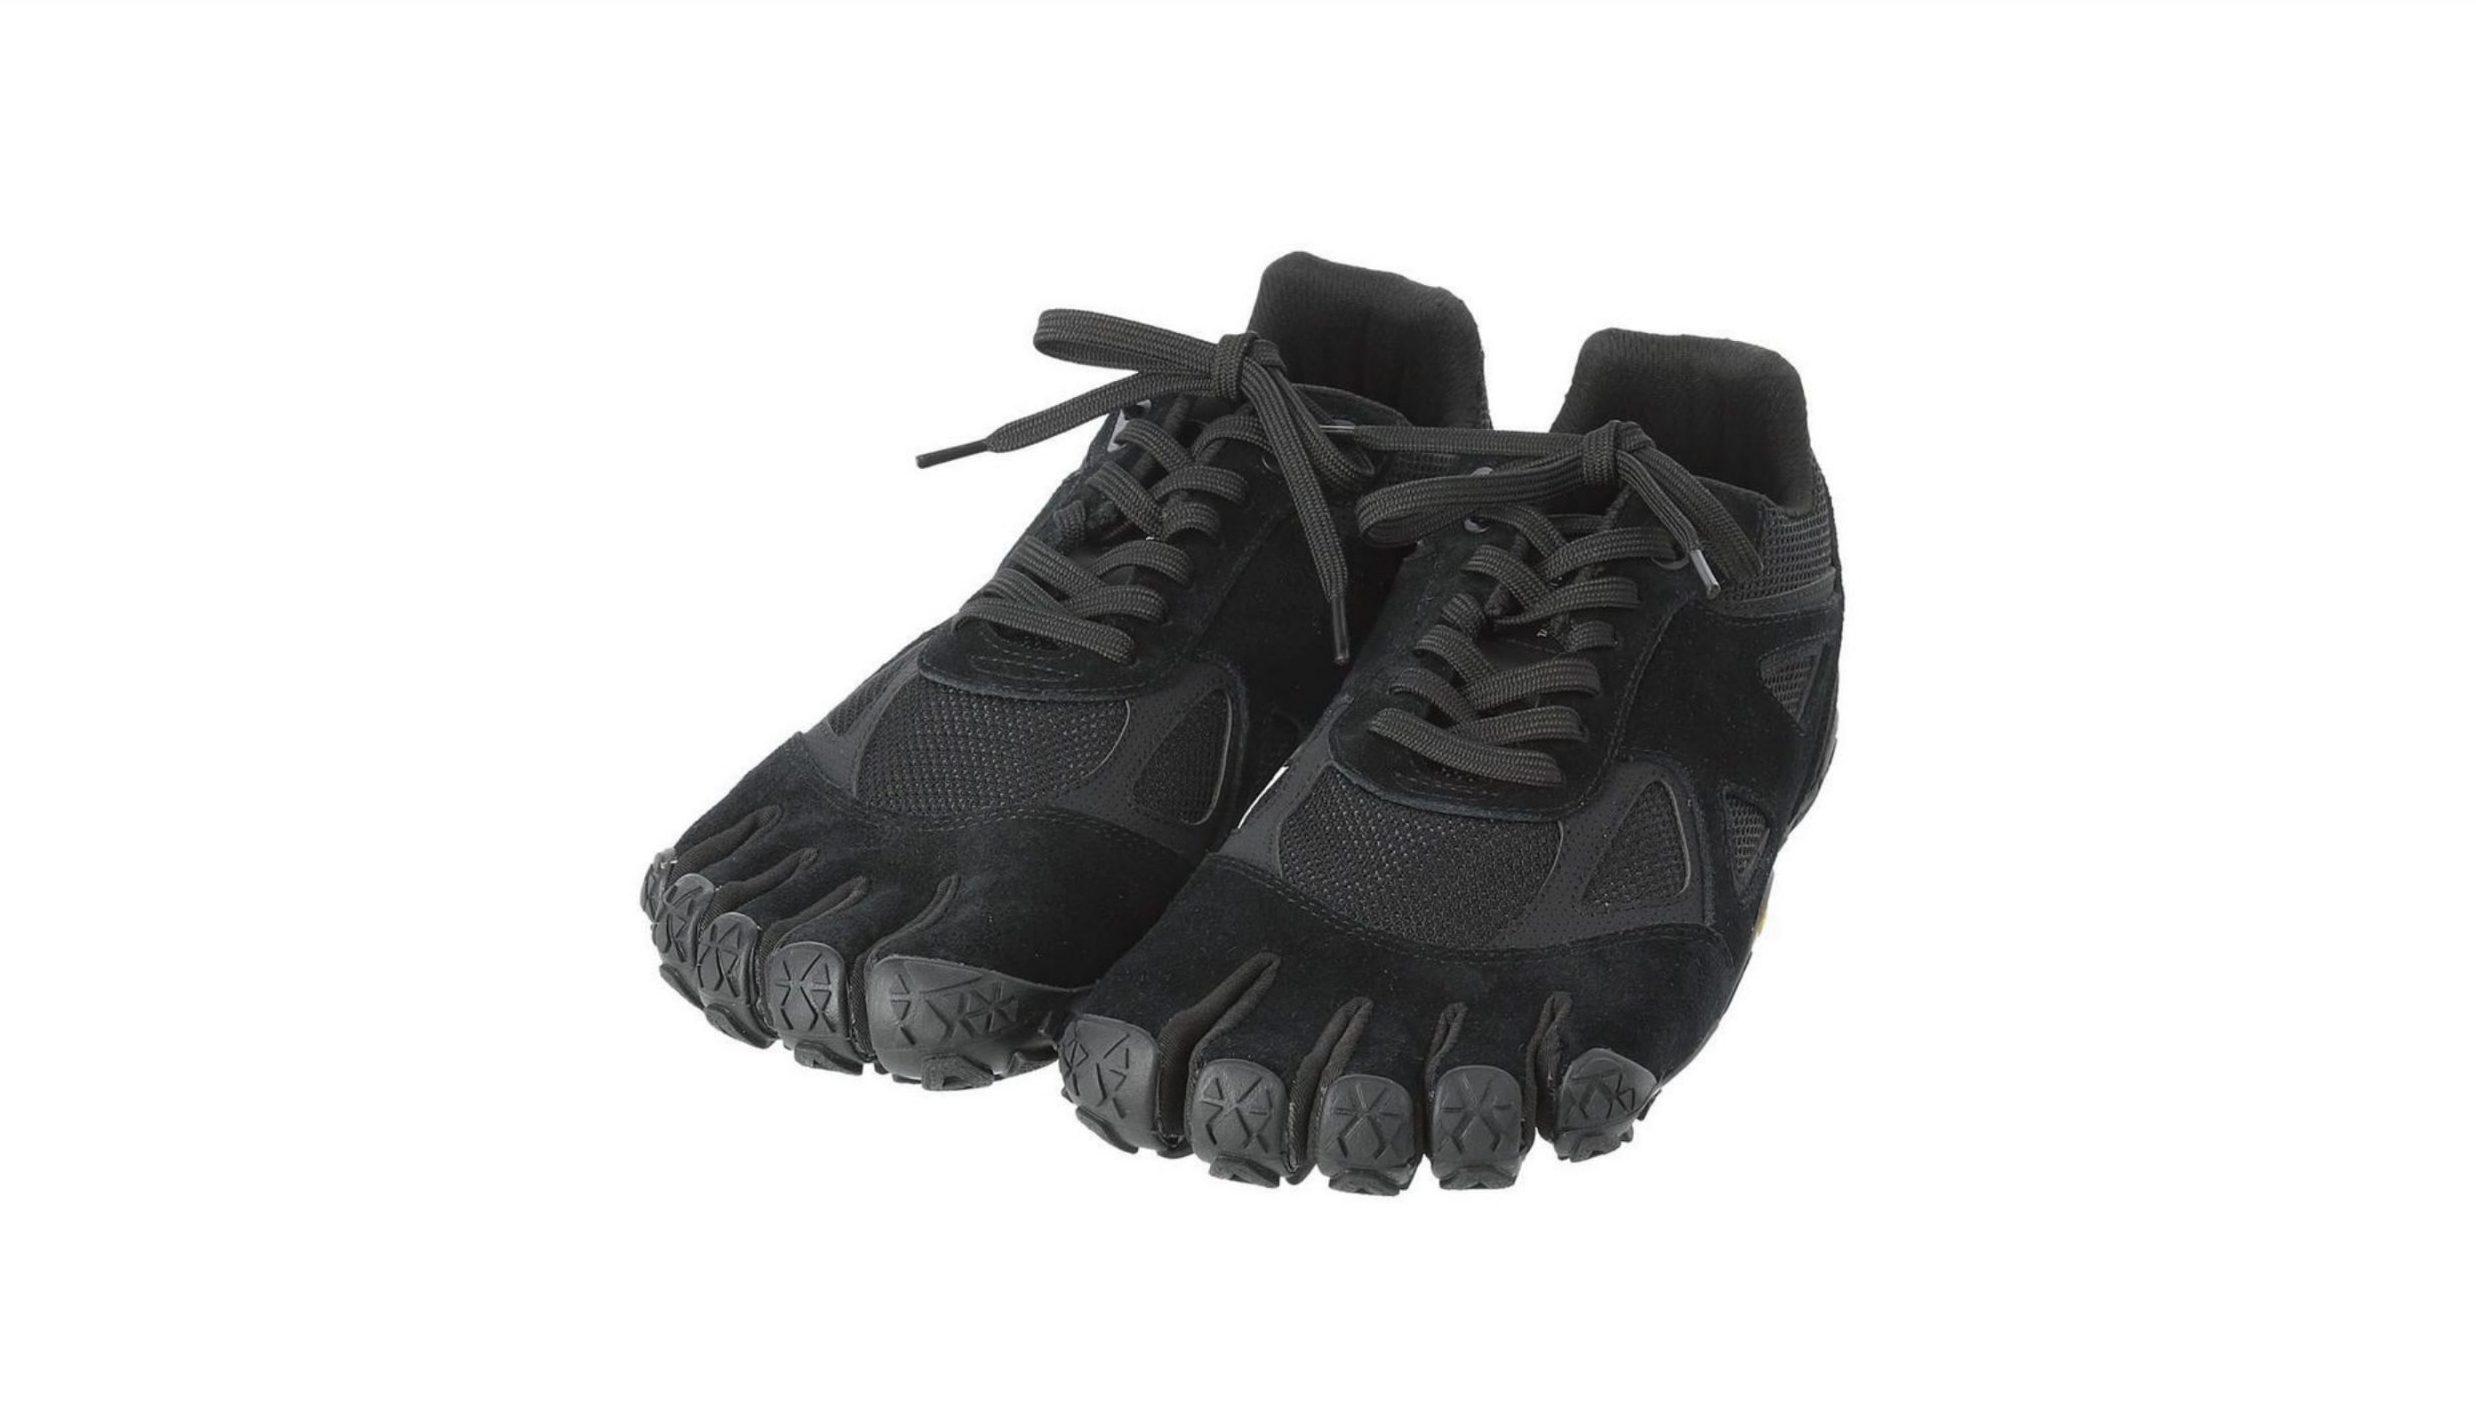 VFF BY SUICOKE X TAKAHIROMIYASHITATheSoloist 联乘鞋款正式登场